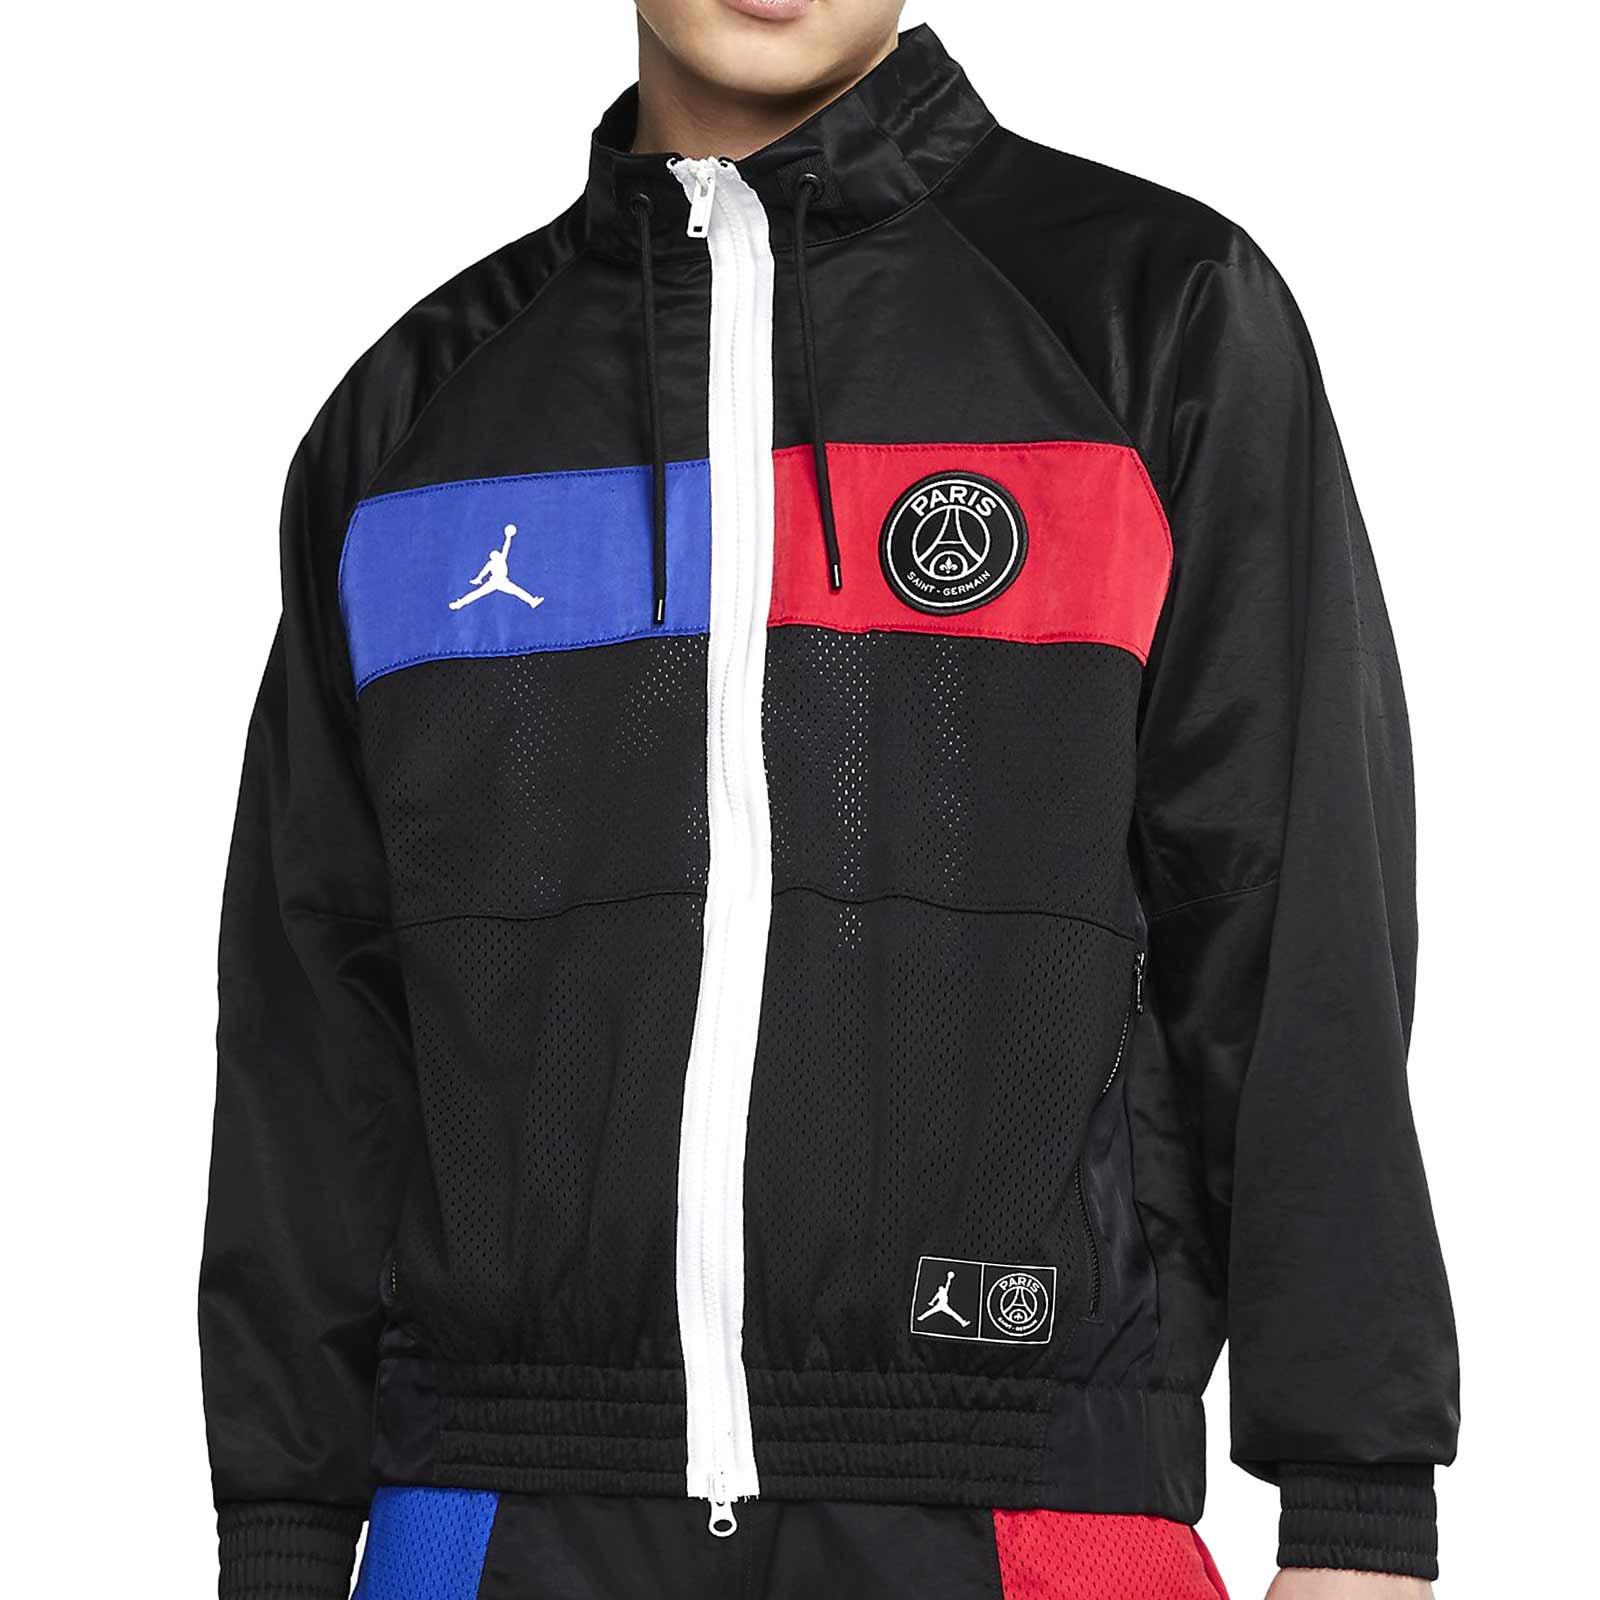 Perfecto Desplazamiento Por adelantado  Chaqueta chándal Nike PSG x Jordan negra | futbolmania